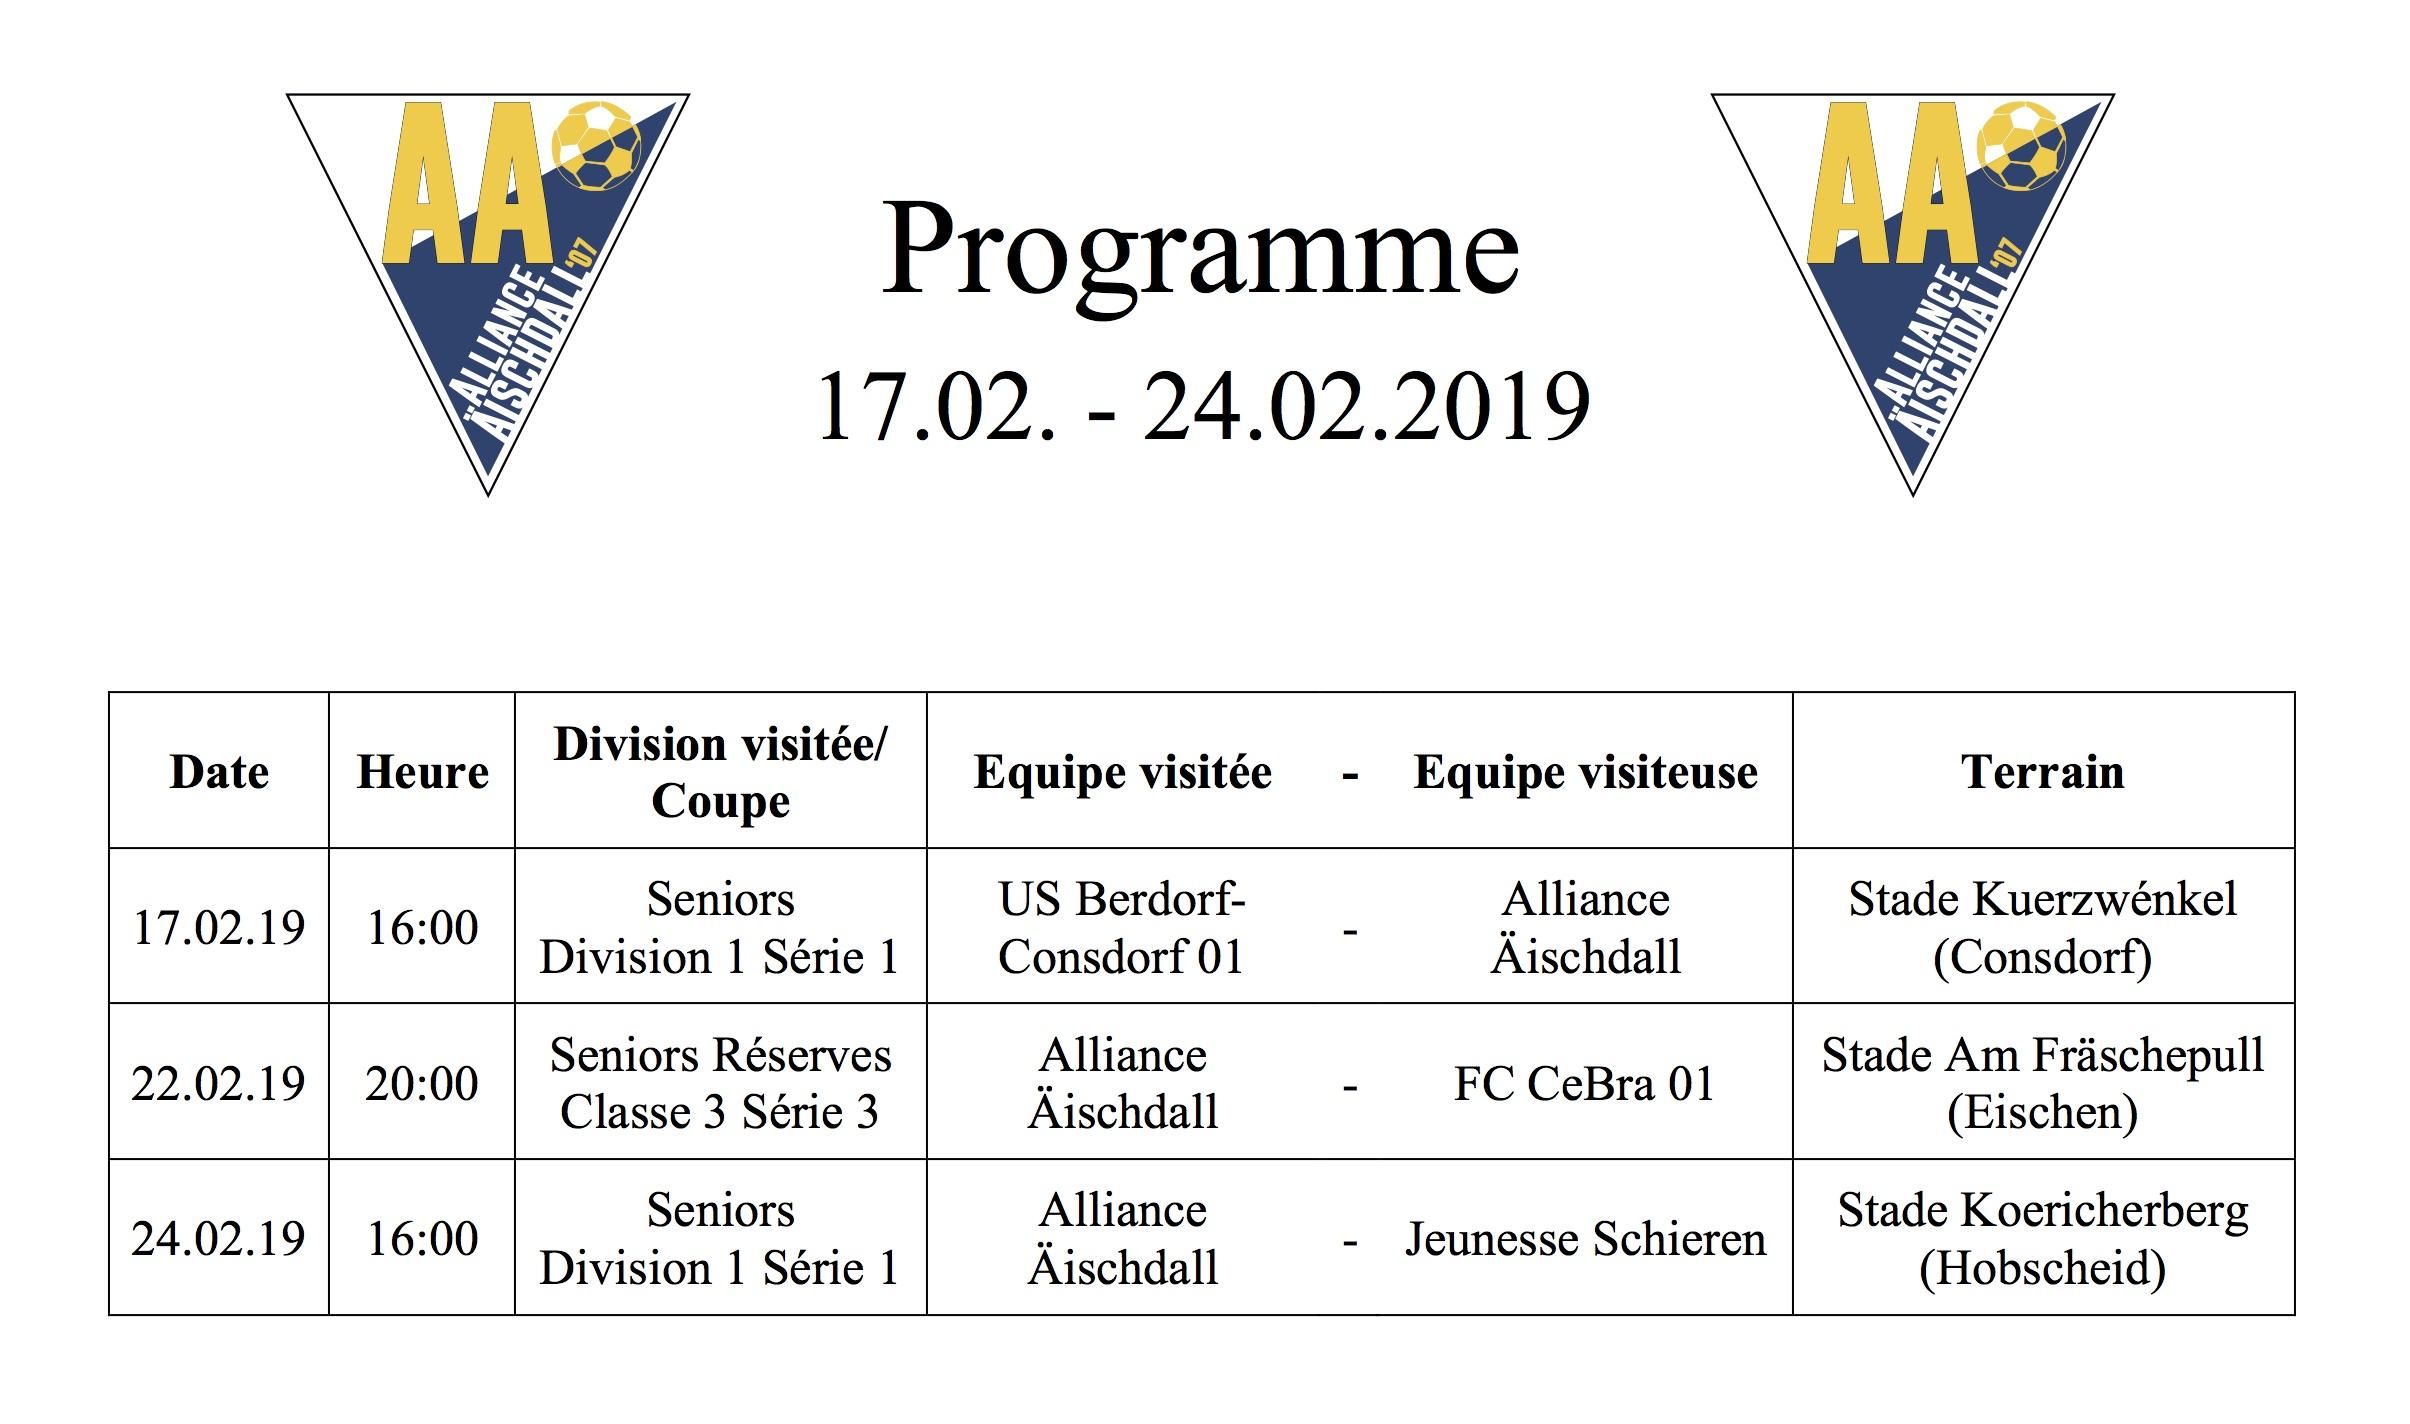 Programm 17.02.-24.02.2019